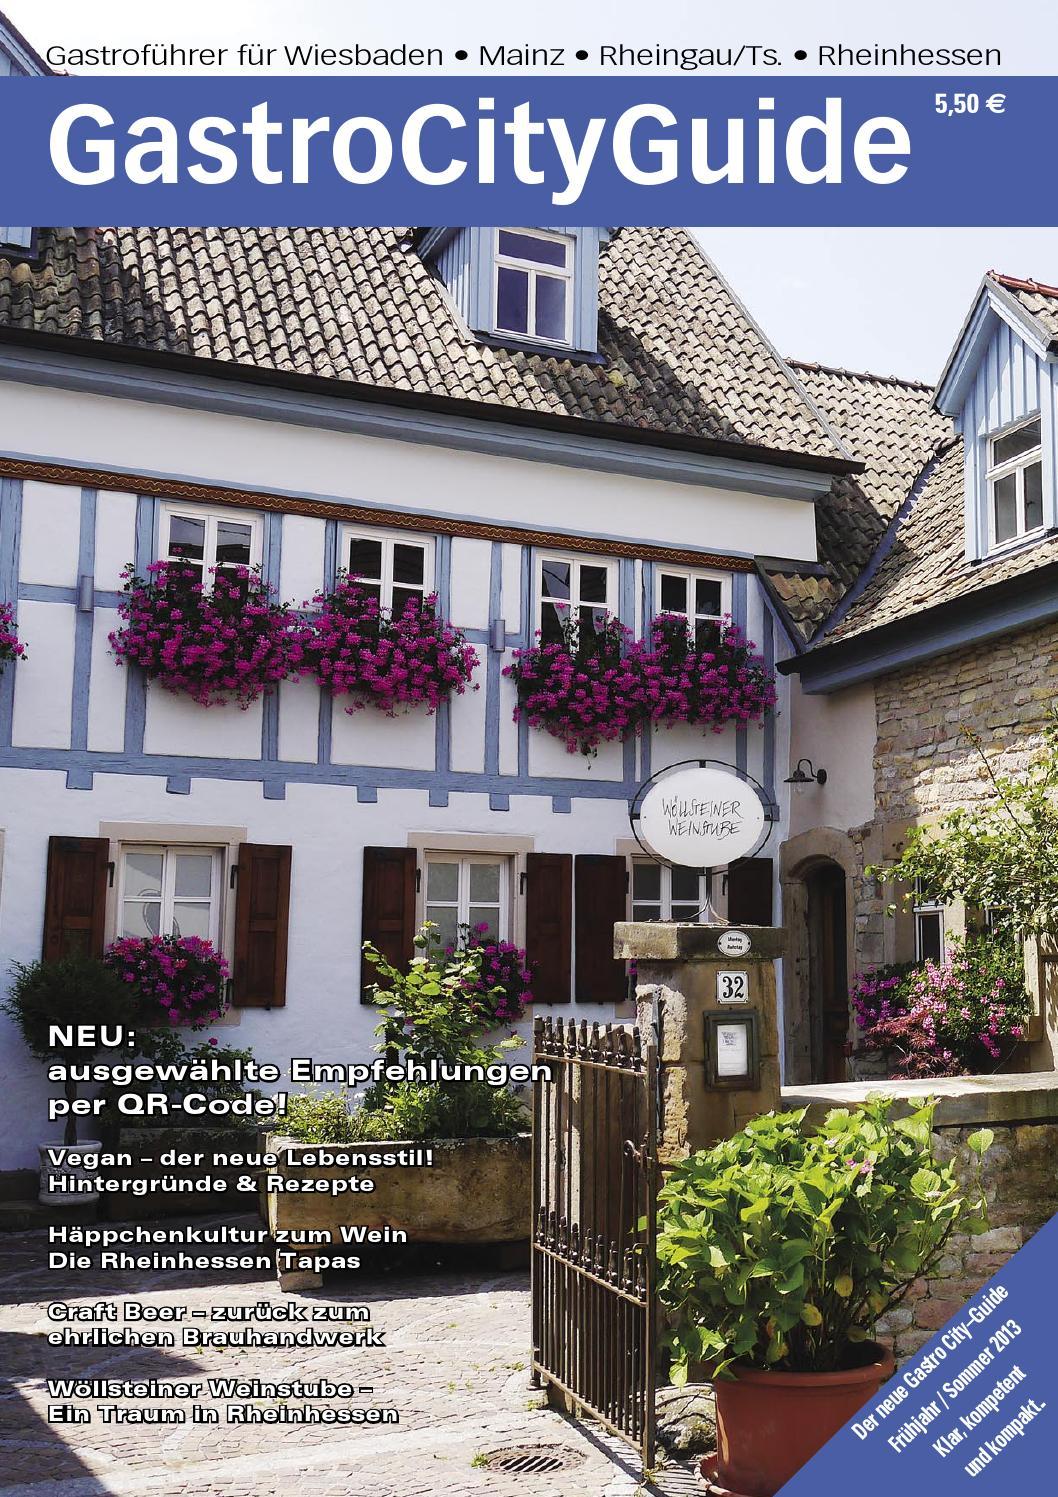 GastroCityGuide, Ausgabe 0113 by Petra Esser - issuu